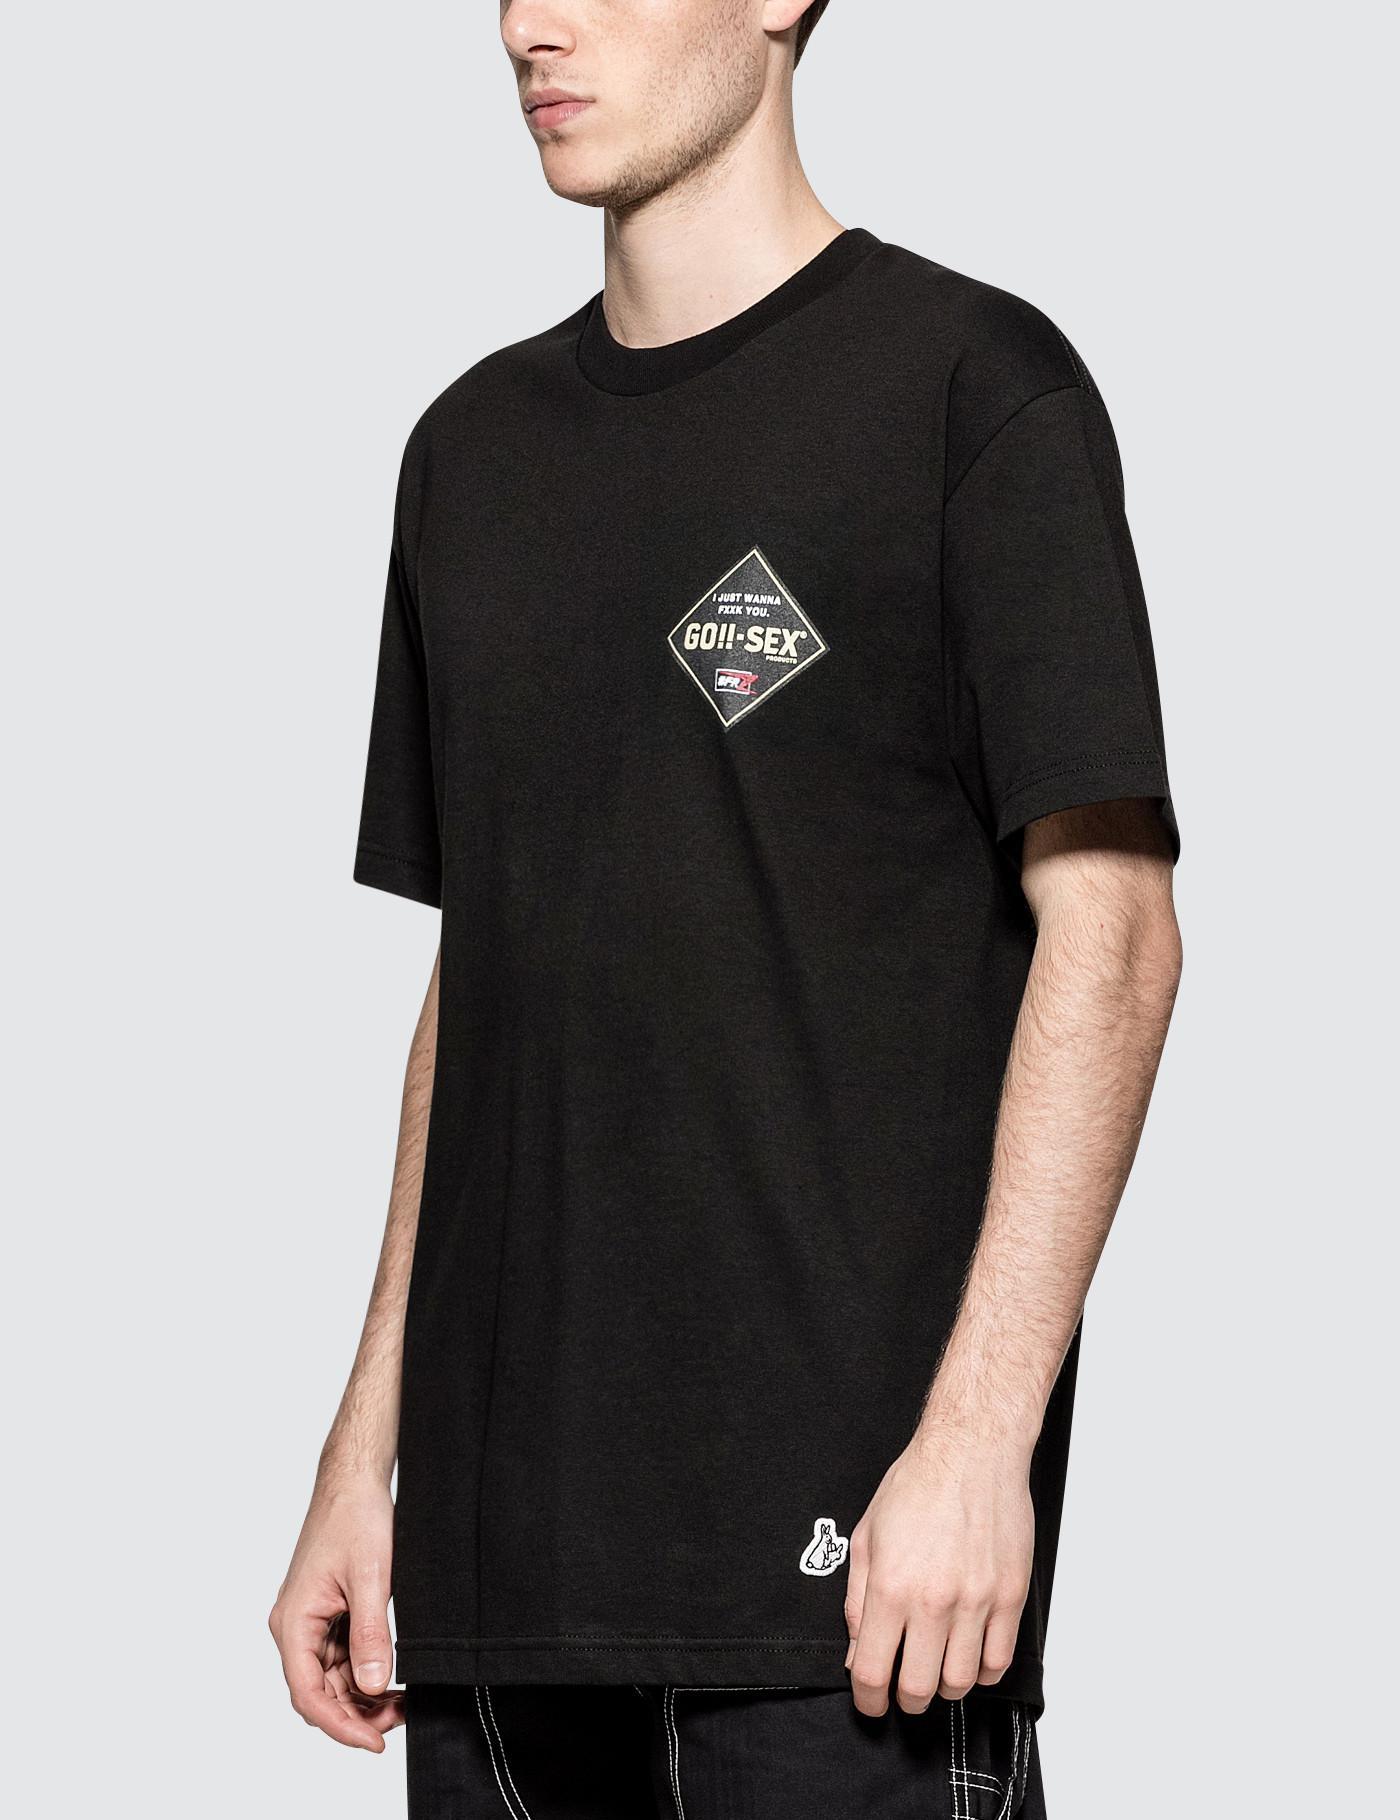 3b1bbbdbc79 FR2 Go-sex S s T-shirt in Black for Men - Lyst